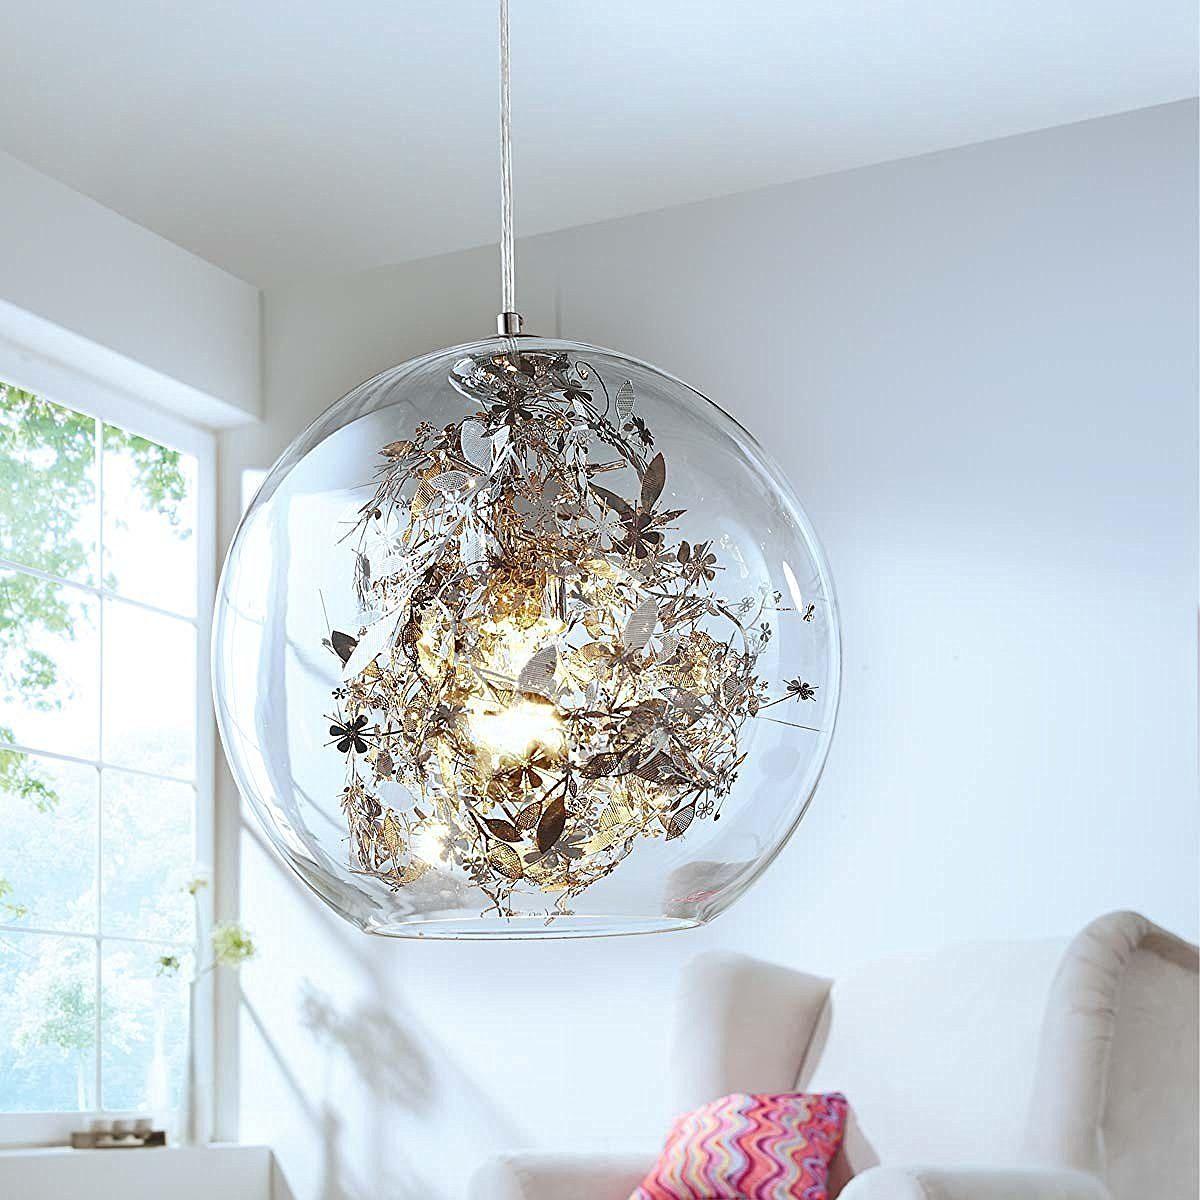 Design Deckenleuchte St. Barth Metall Glasschirm Chrom 1x E27 max ...